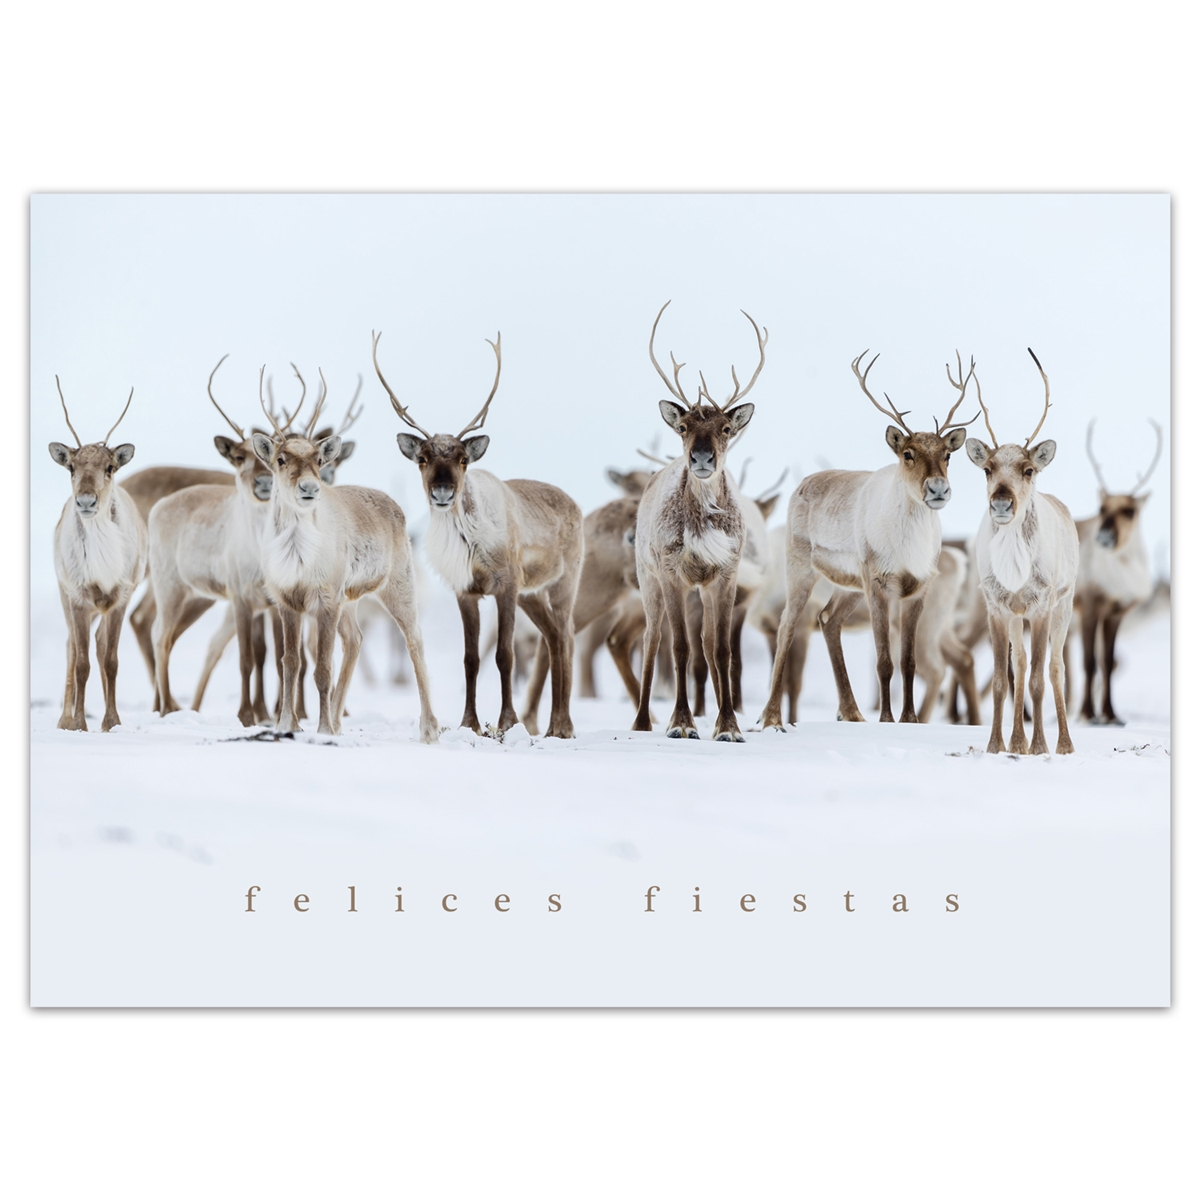 Caribou Curiosity Card - Spanish